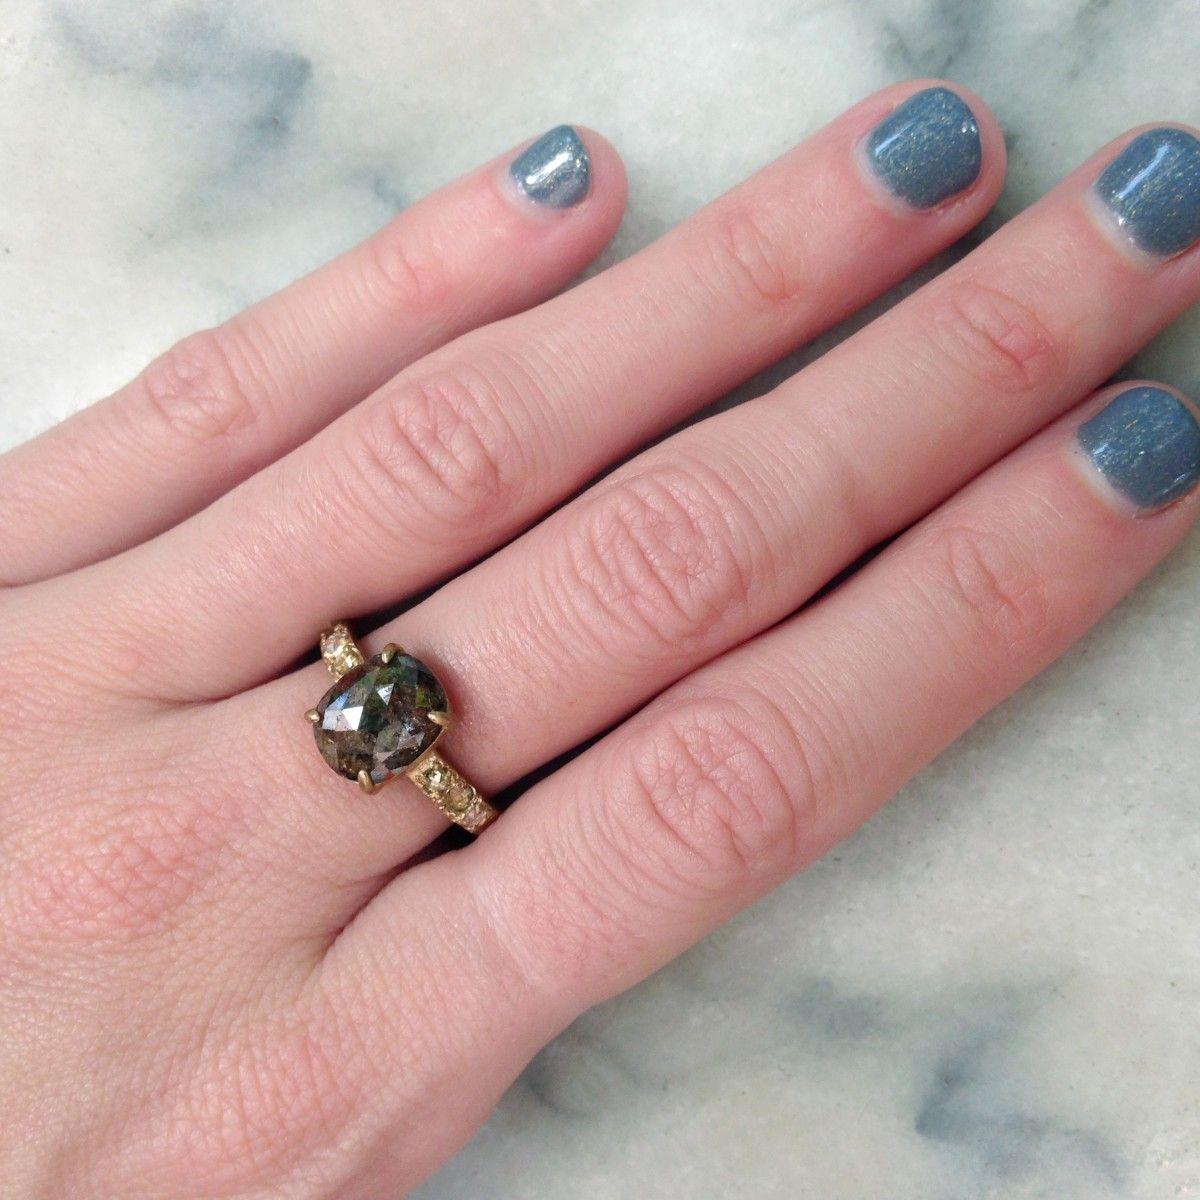 2.2 Carat Rosecut Opaque Diamond Ring | Jewelry | Pinterest | Dark ...